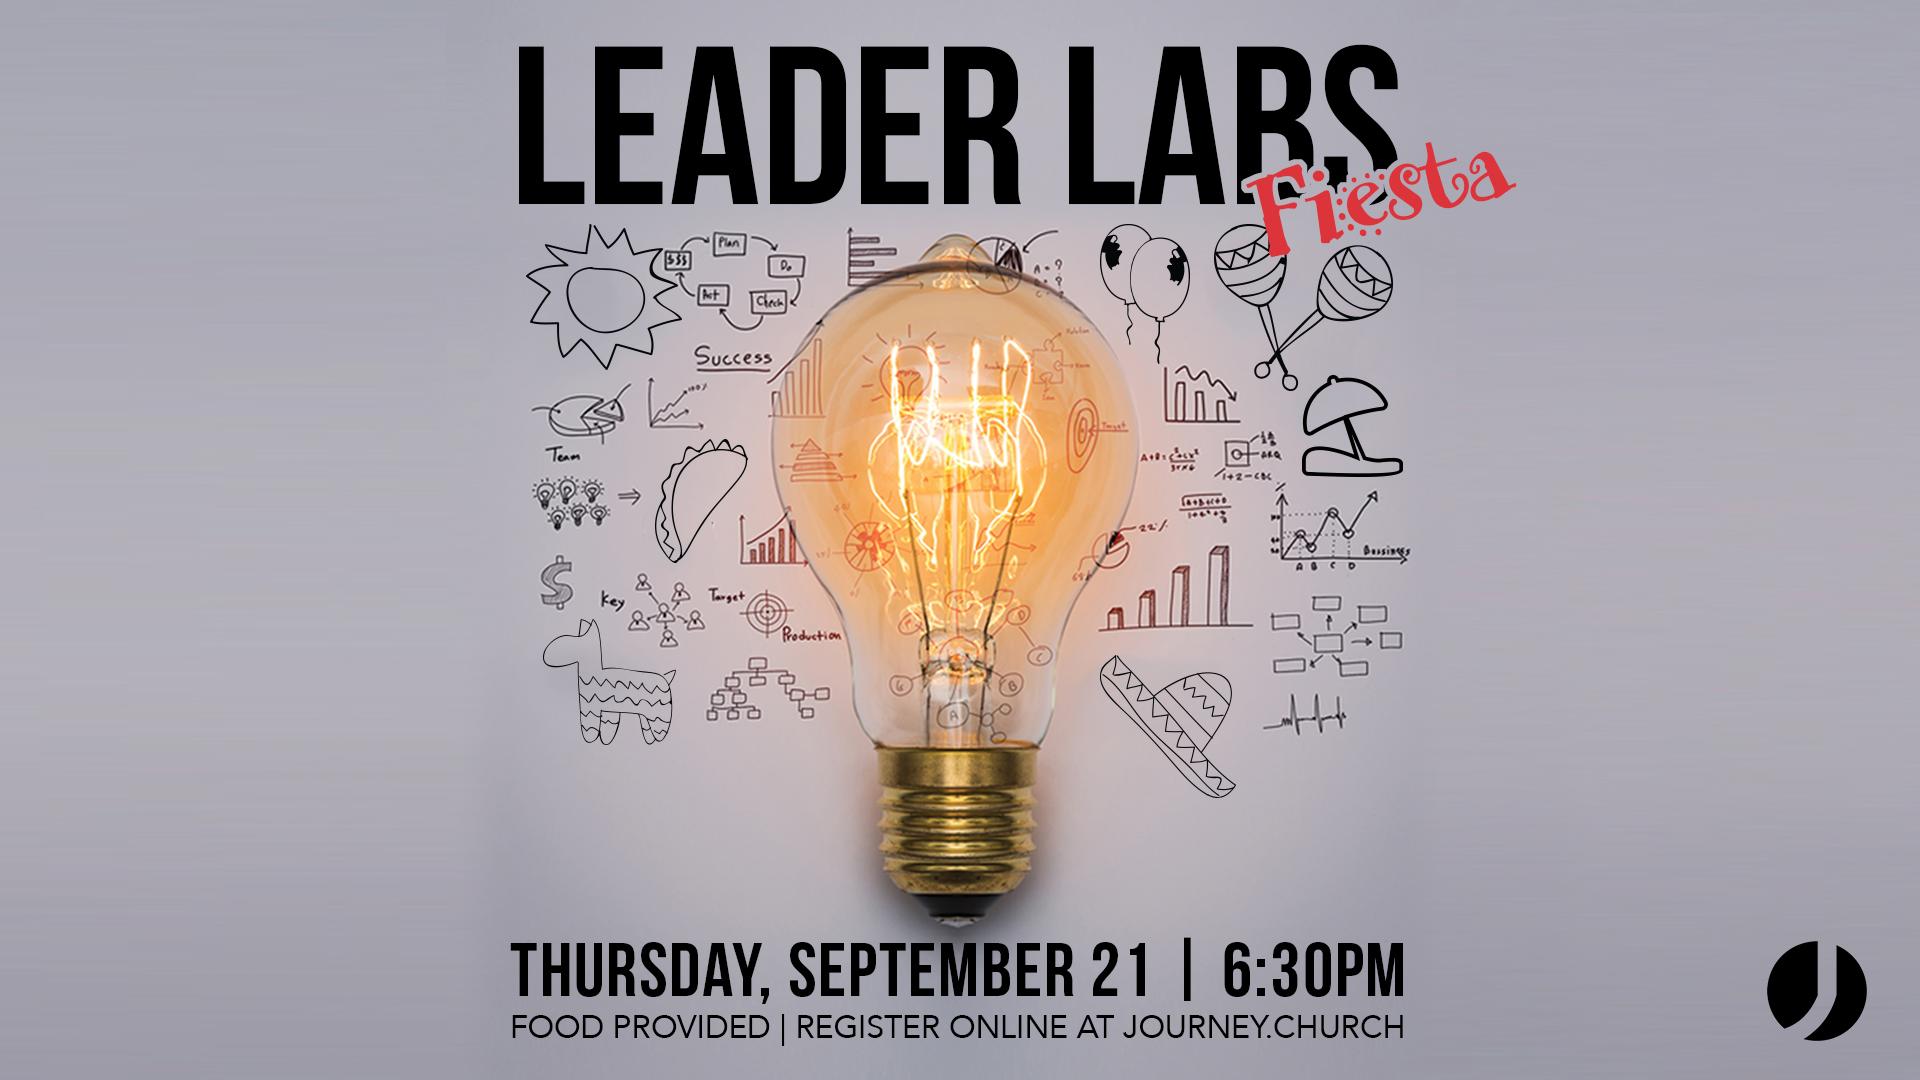 Leader lab fiesta 1920x1080  1